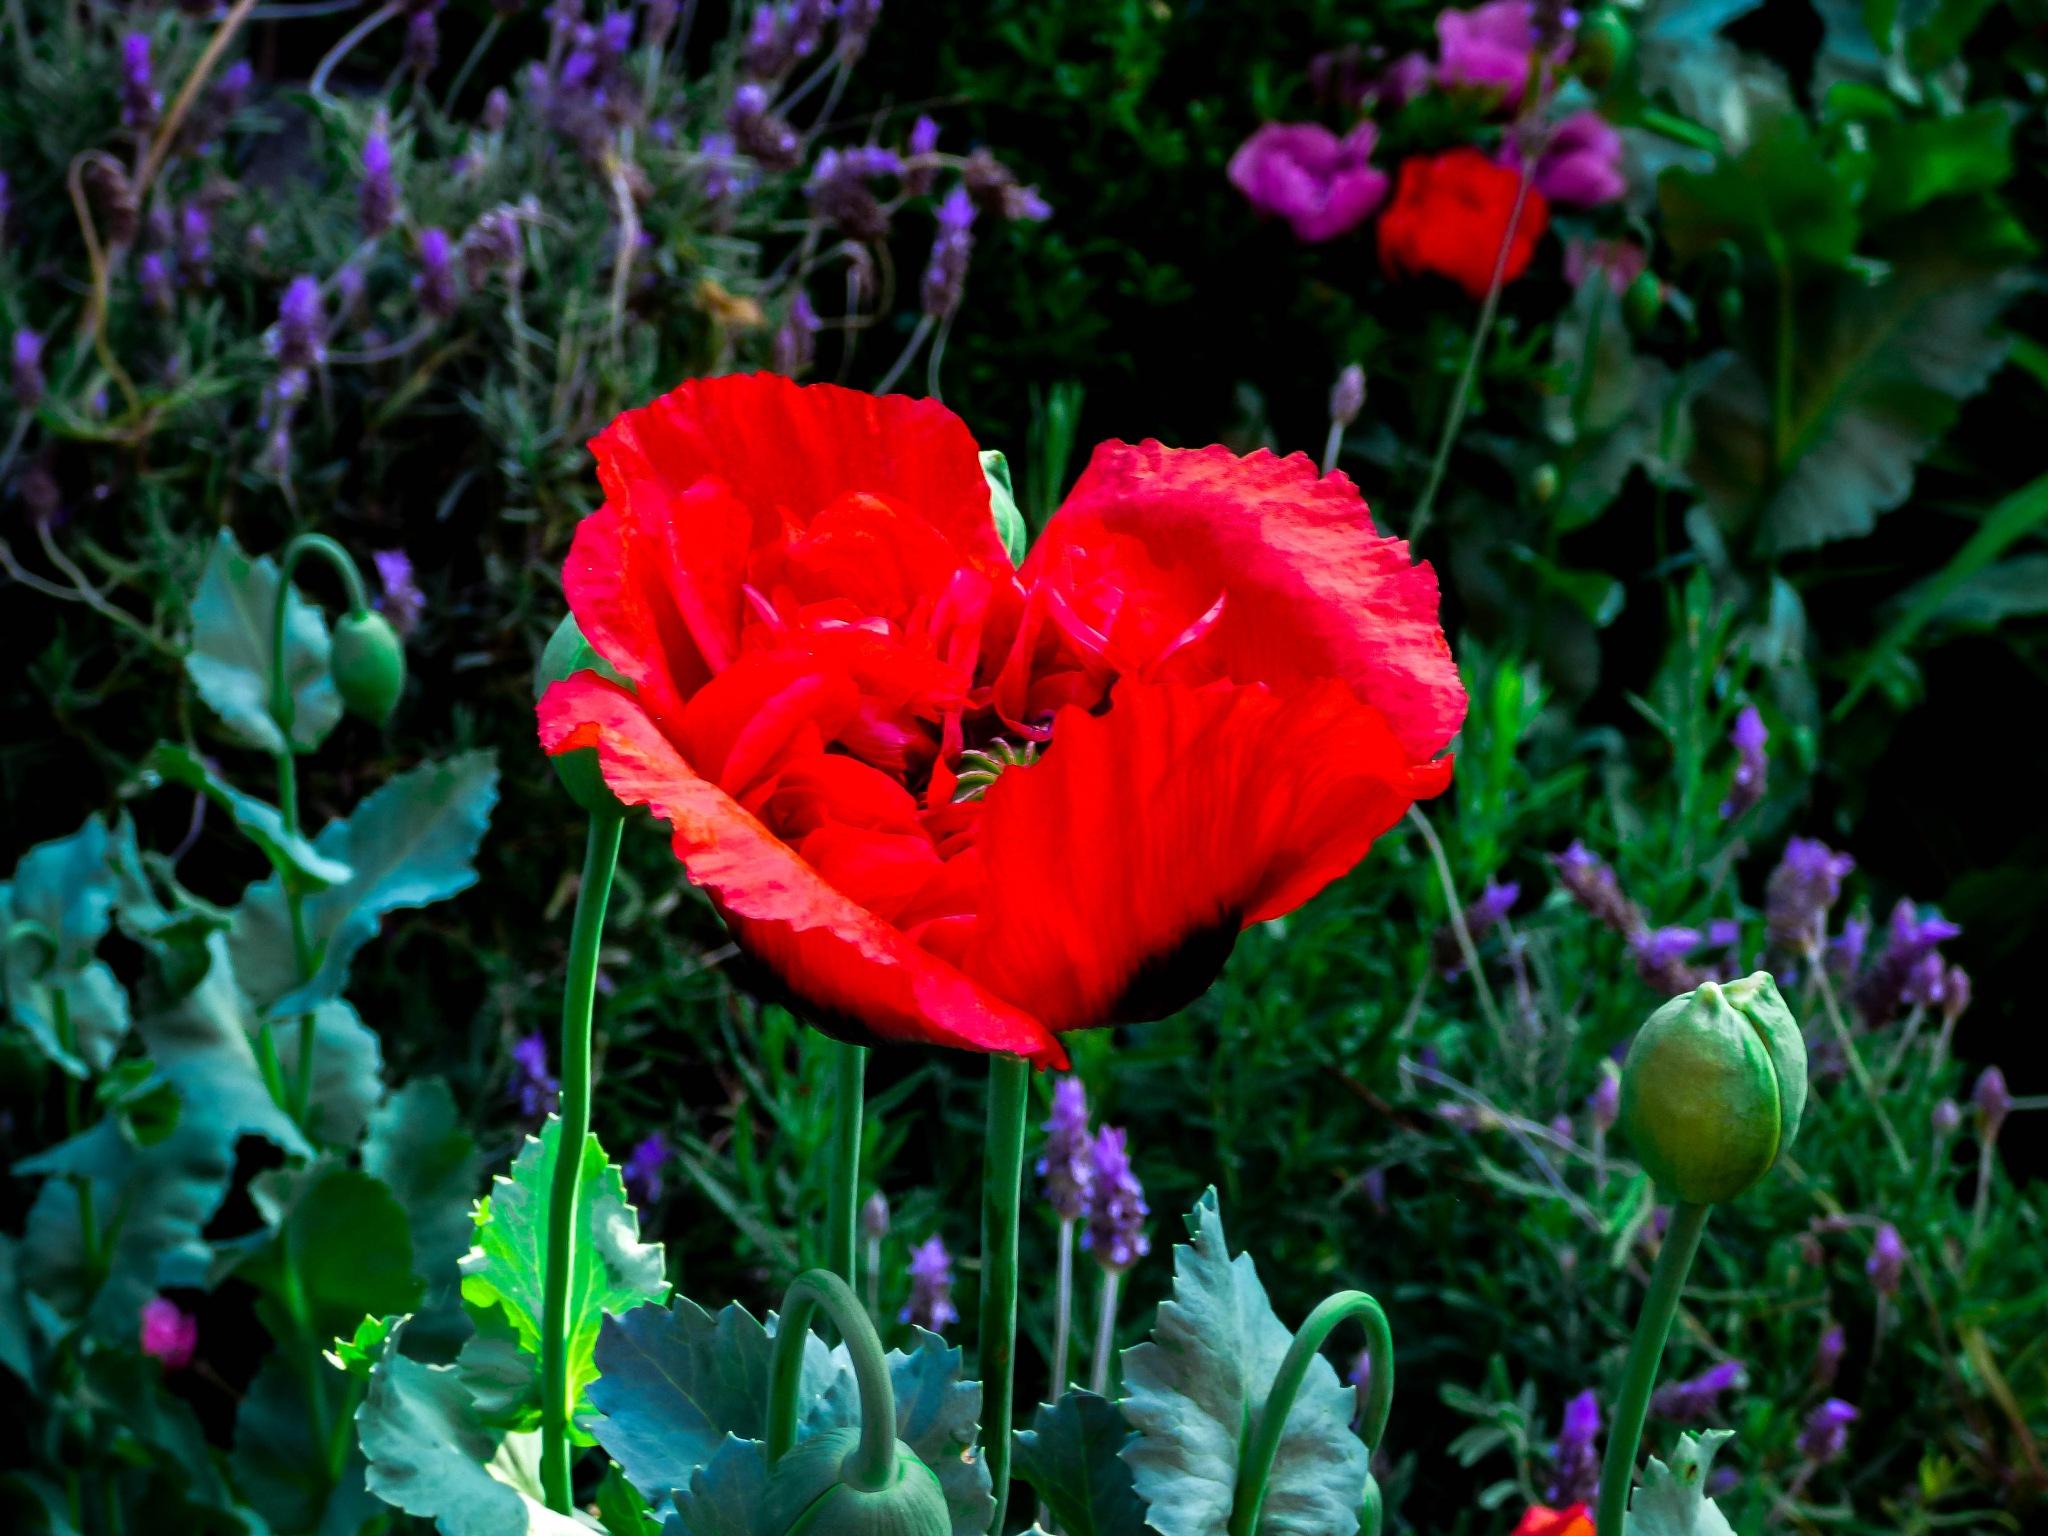 Poppy by Roberto Justo Robiolo